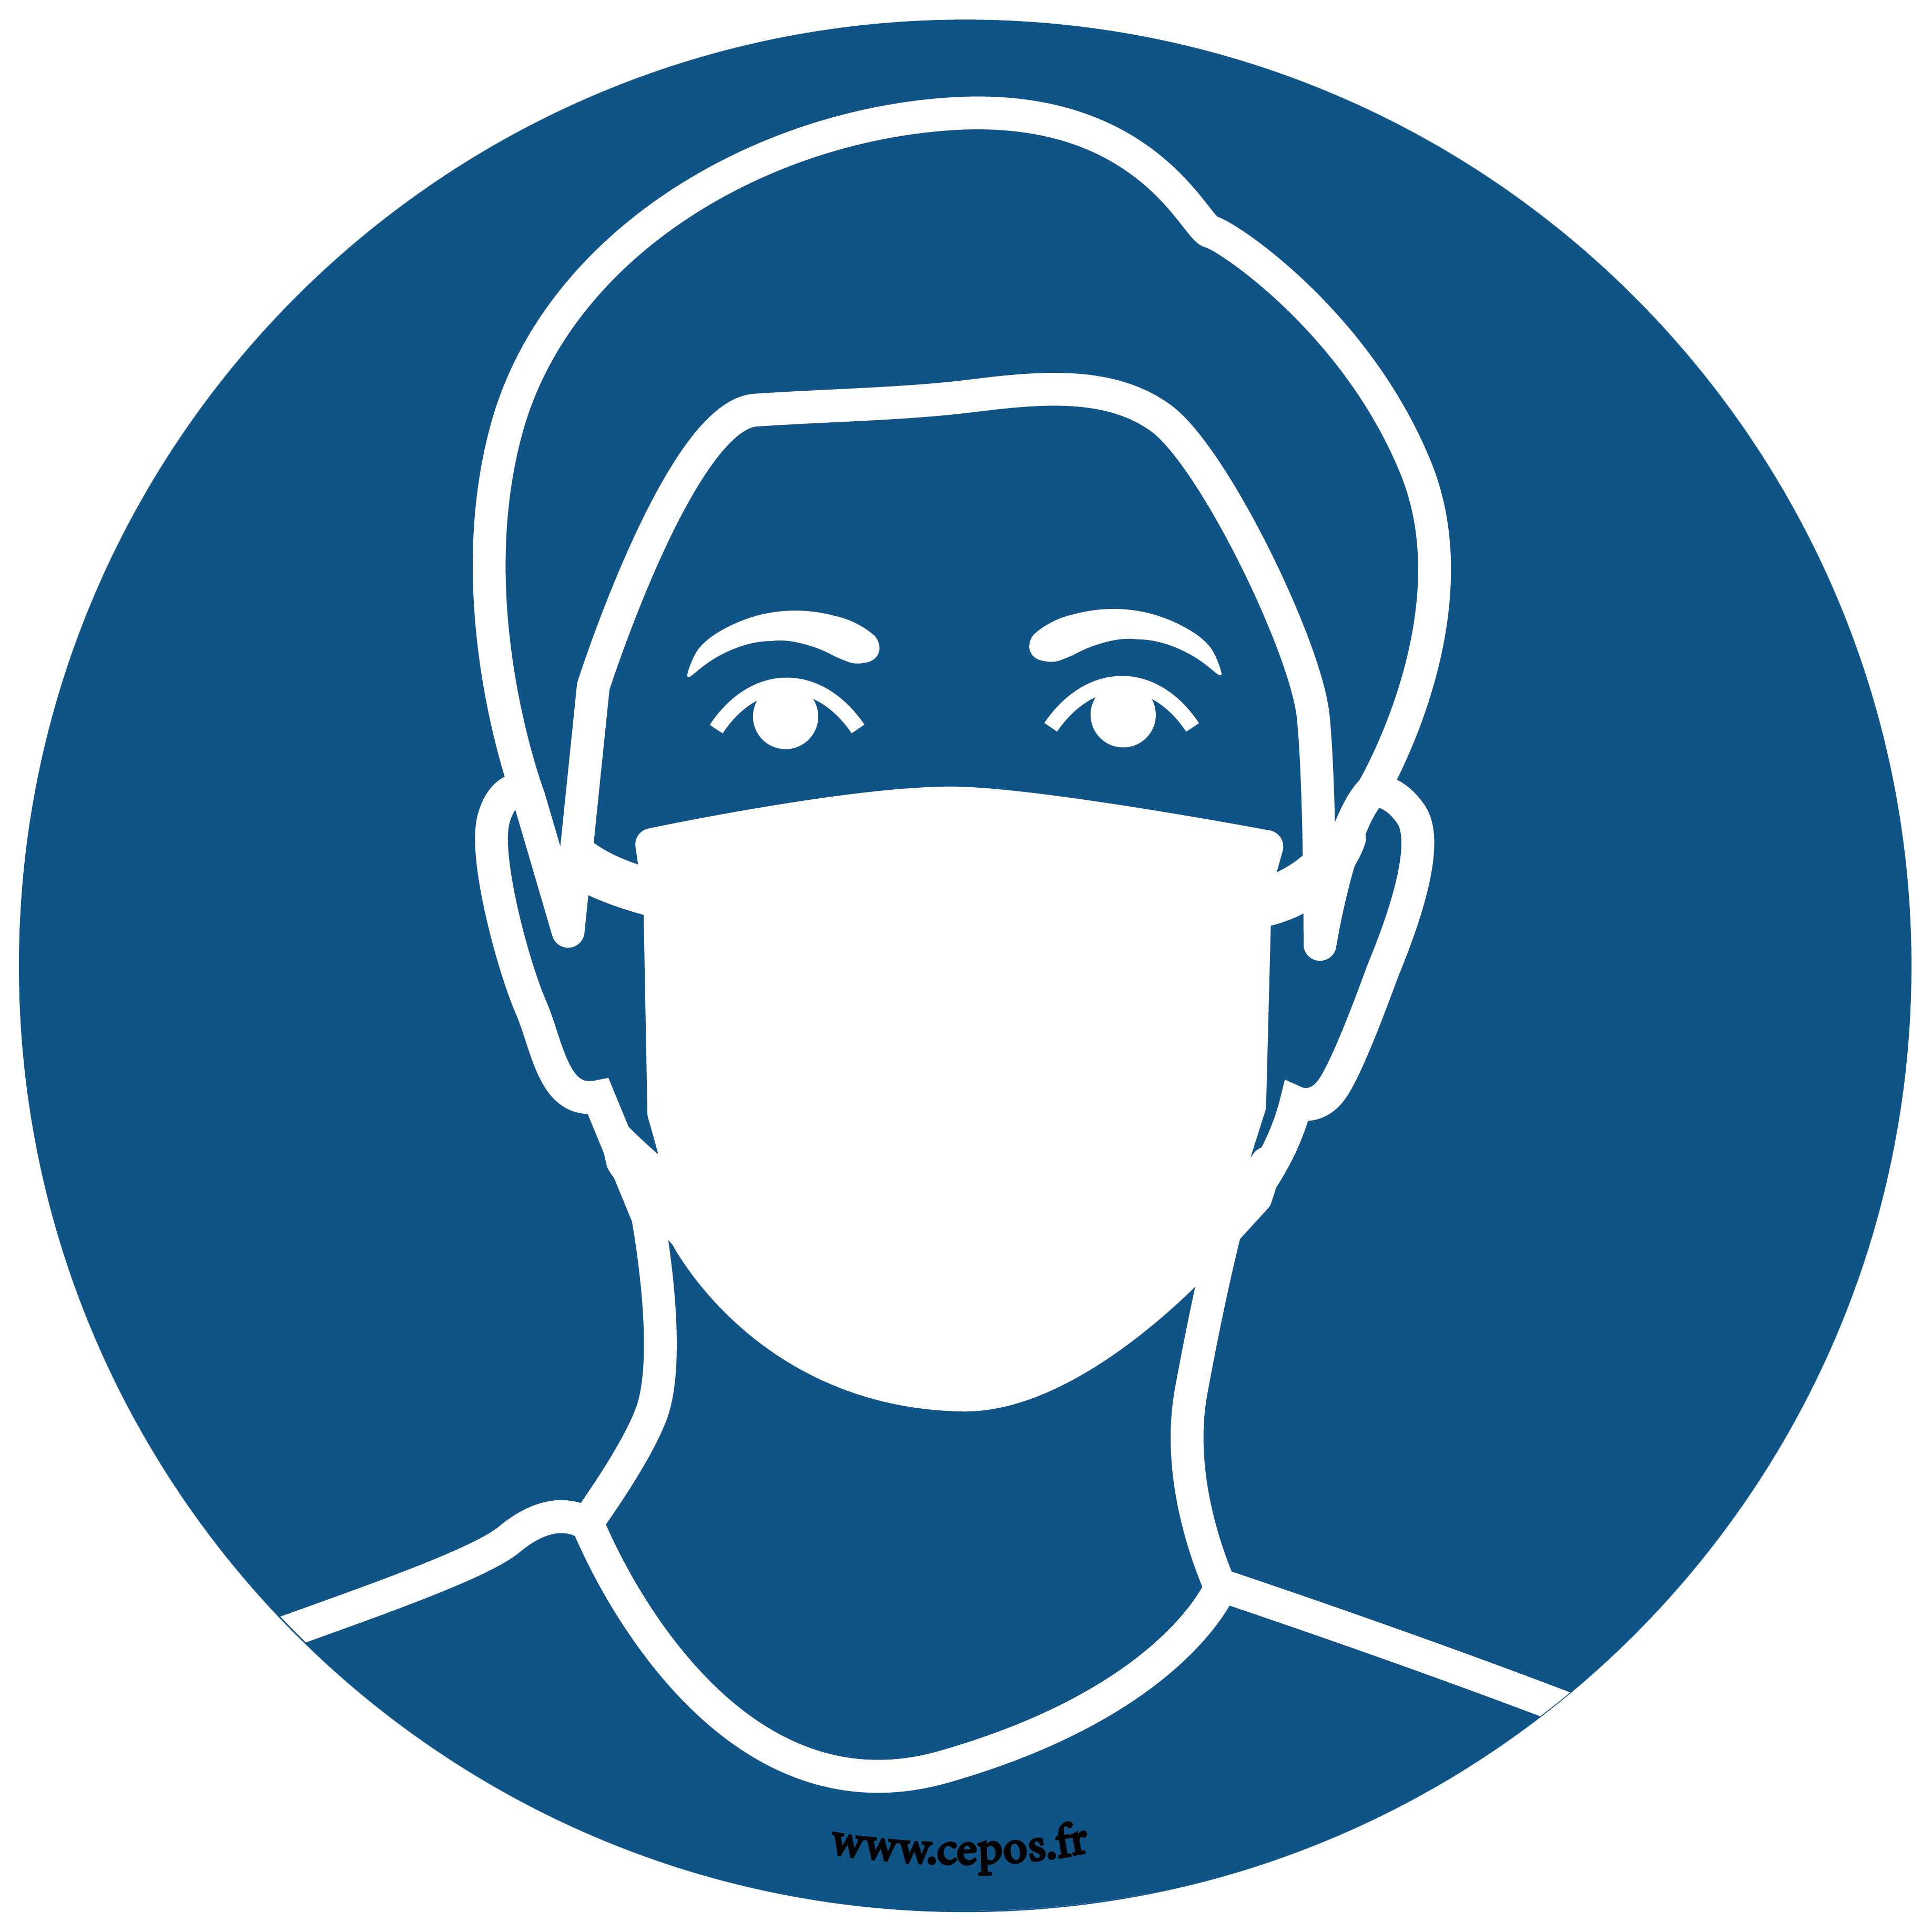 CEP Sticker mural Port du masque obligatoire 7010-163